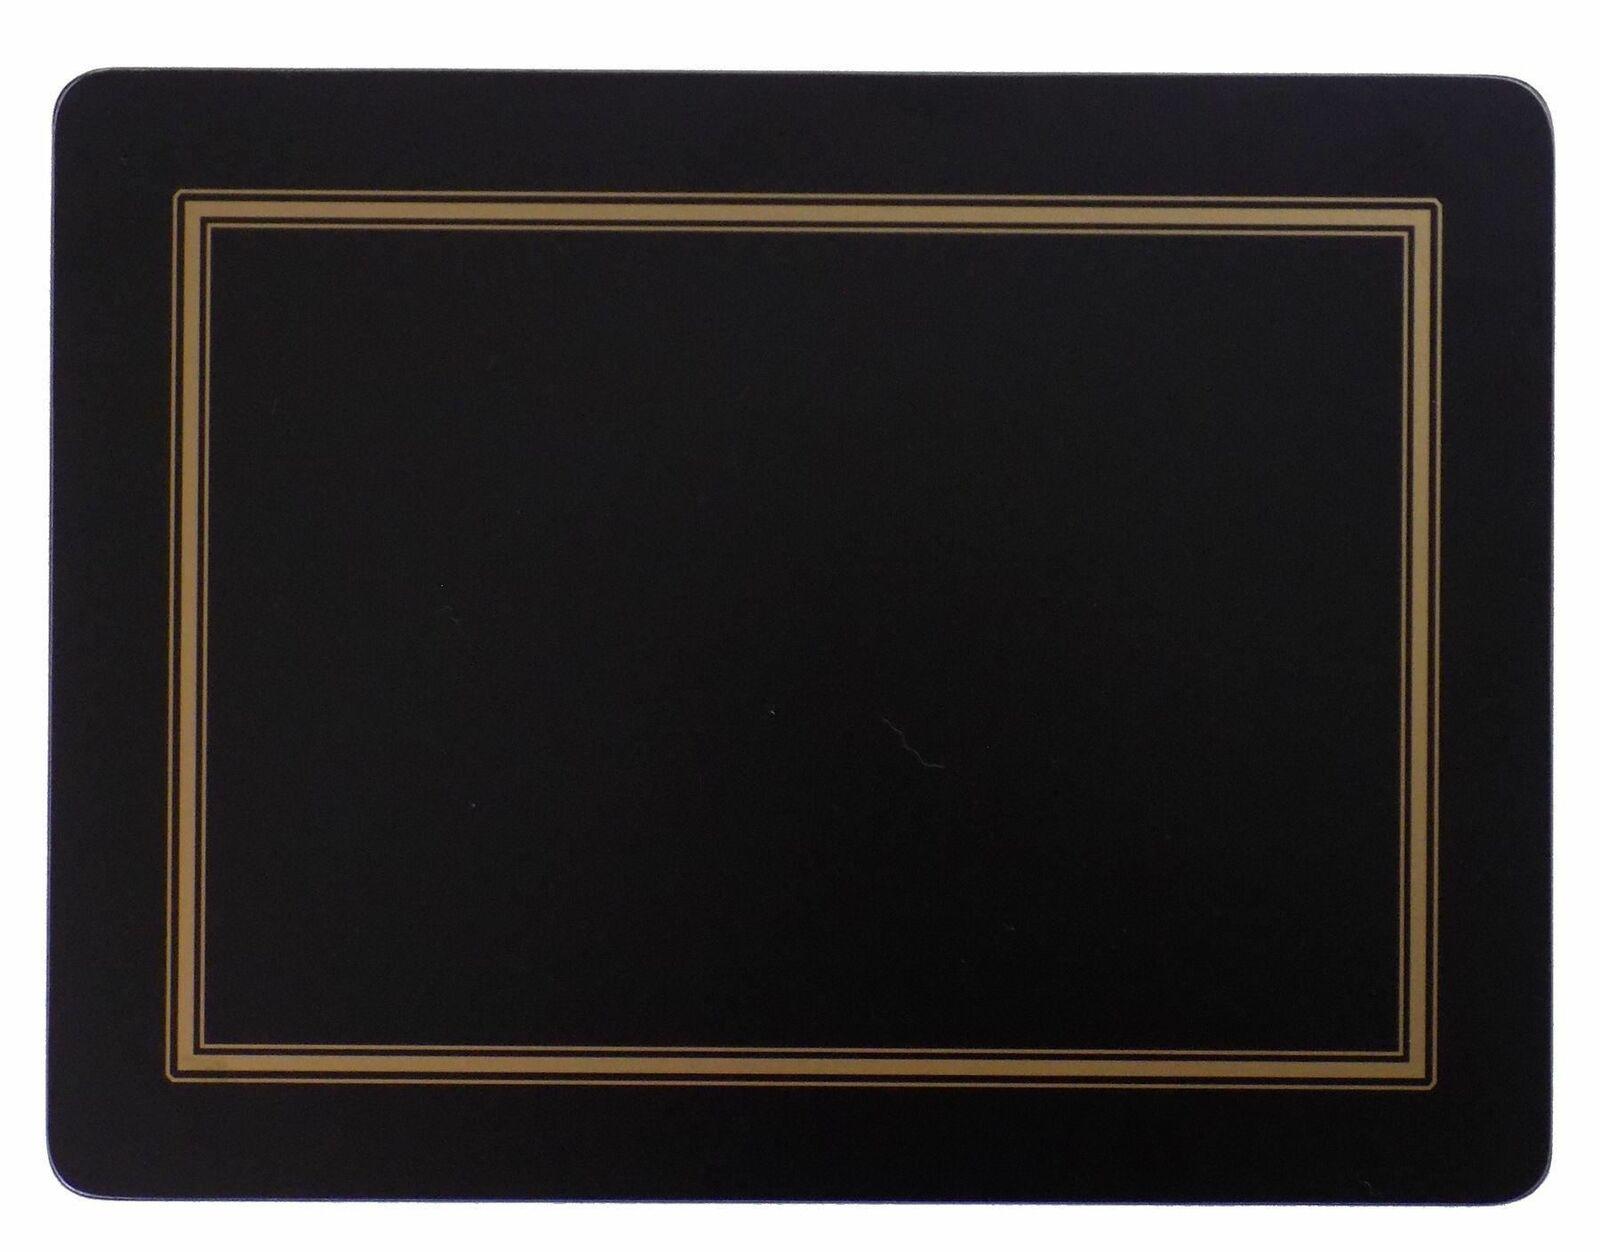 Juego de 4 Gold schwarz Bordeado Clásico Dorso Corcho Grande Manteles Individuales